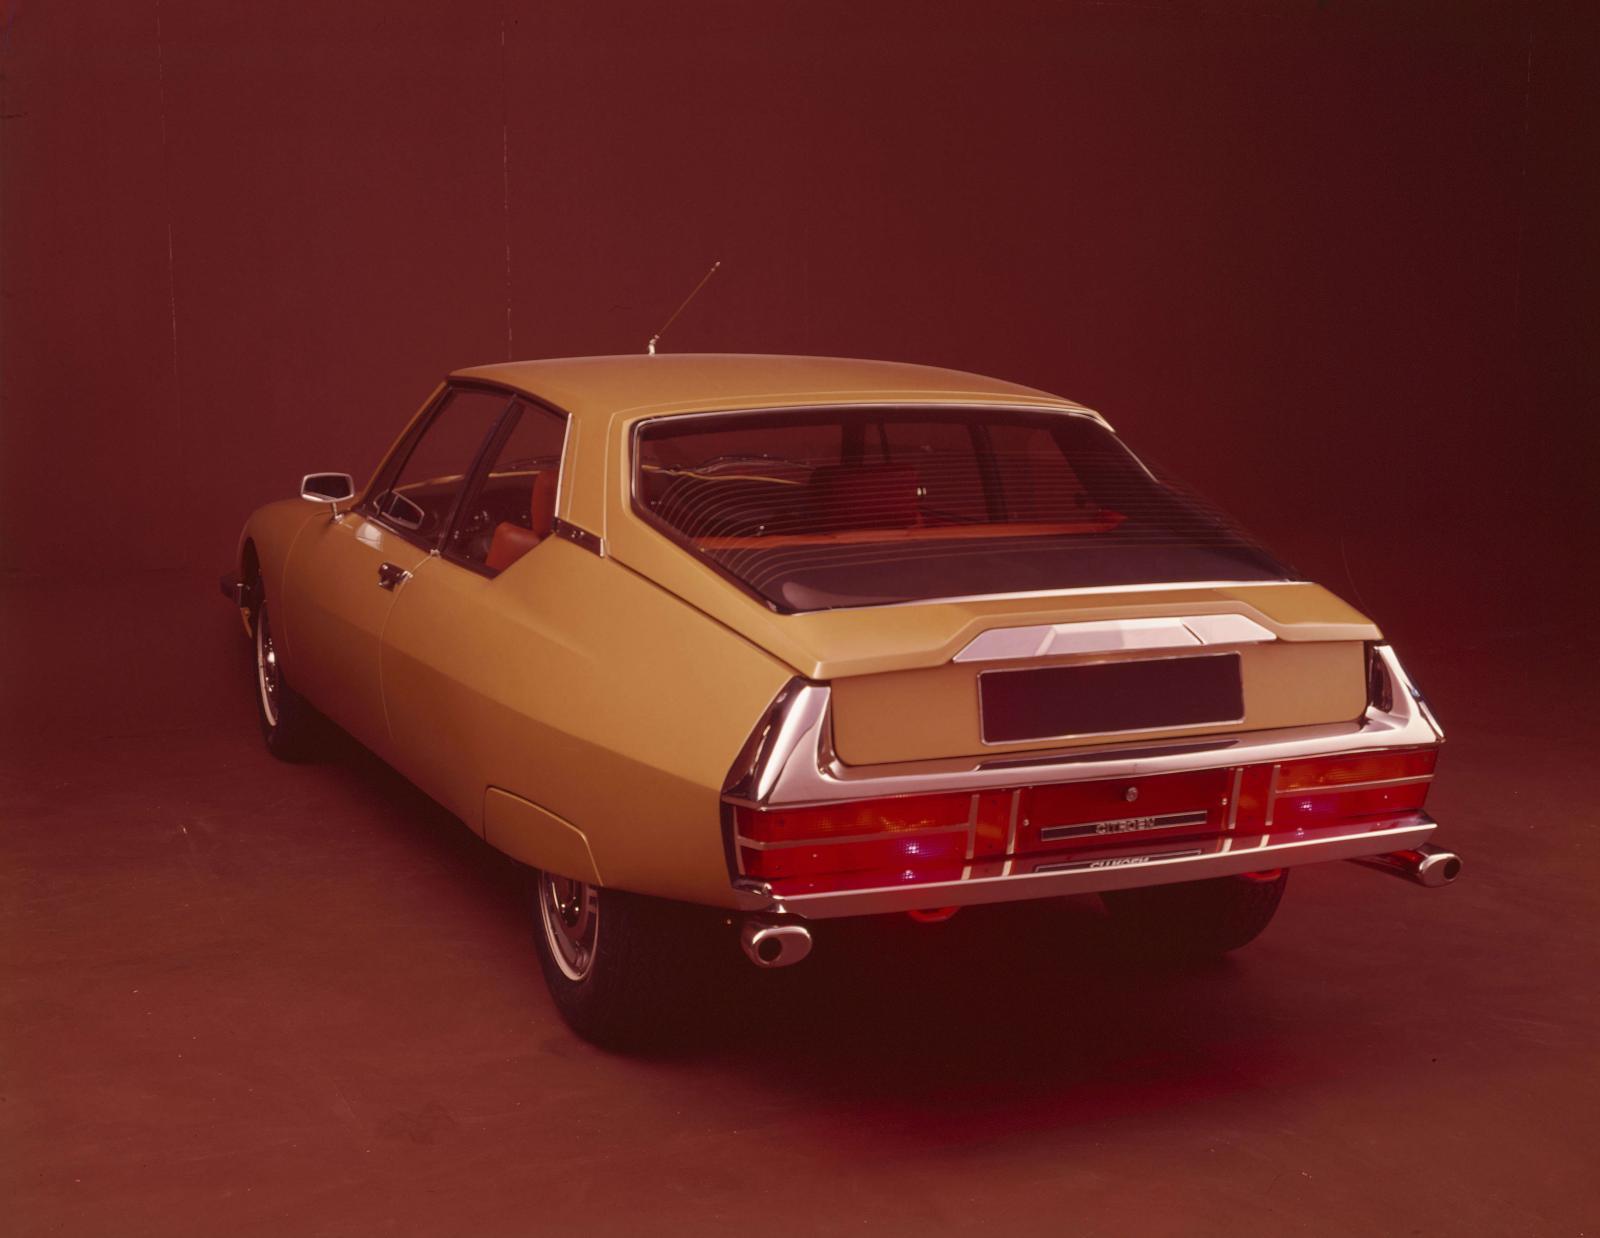 Citroen SM 1970 - 1975 Coupe #5